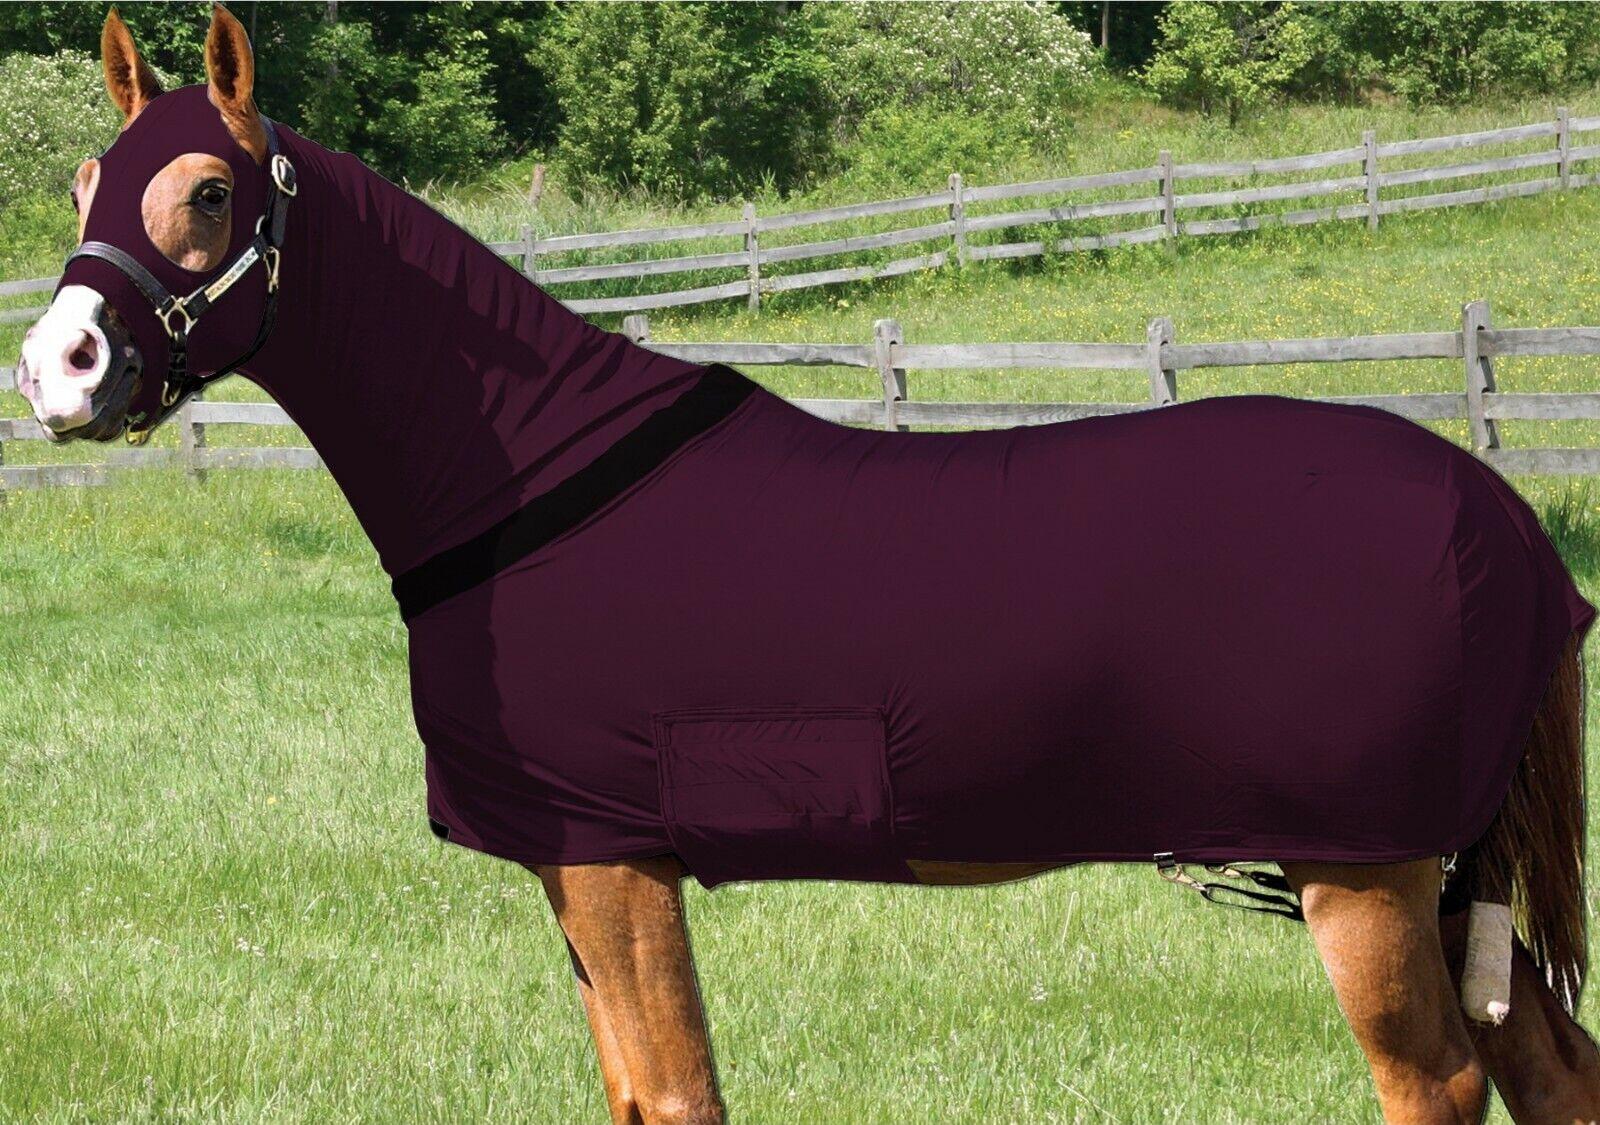 Cavallo Stretch Full Body Tappeto Cofano full body con zip in X-Large Borgogna